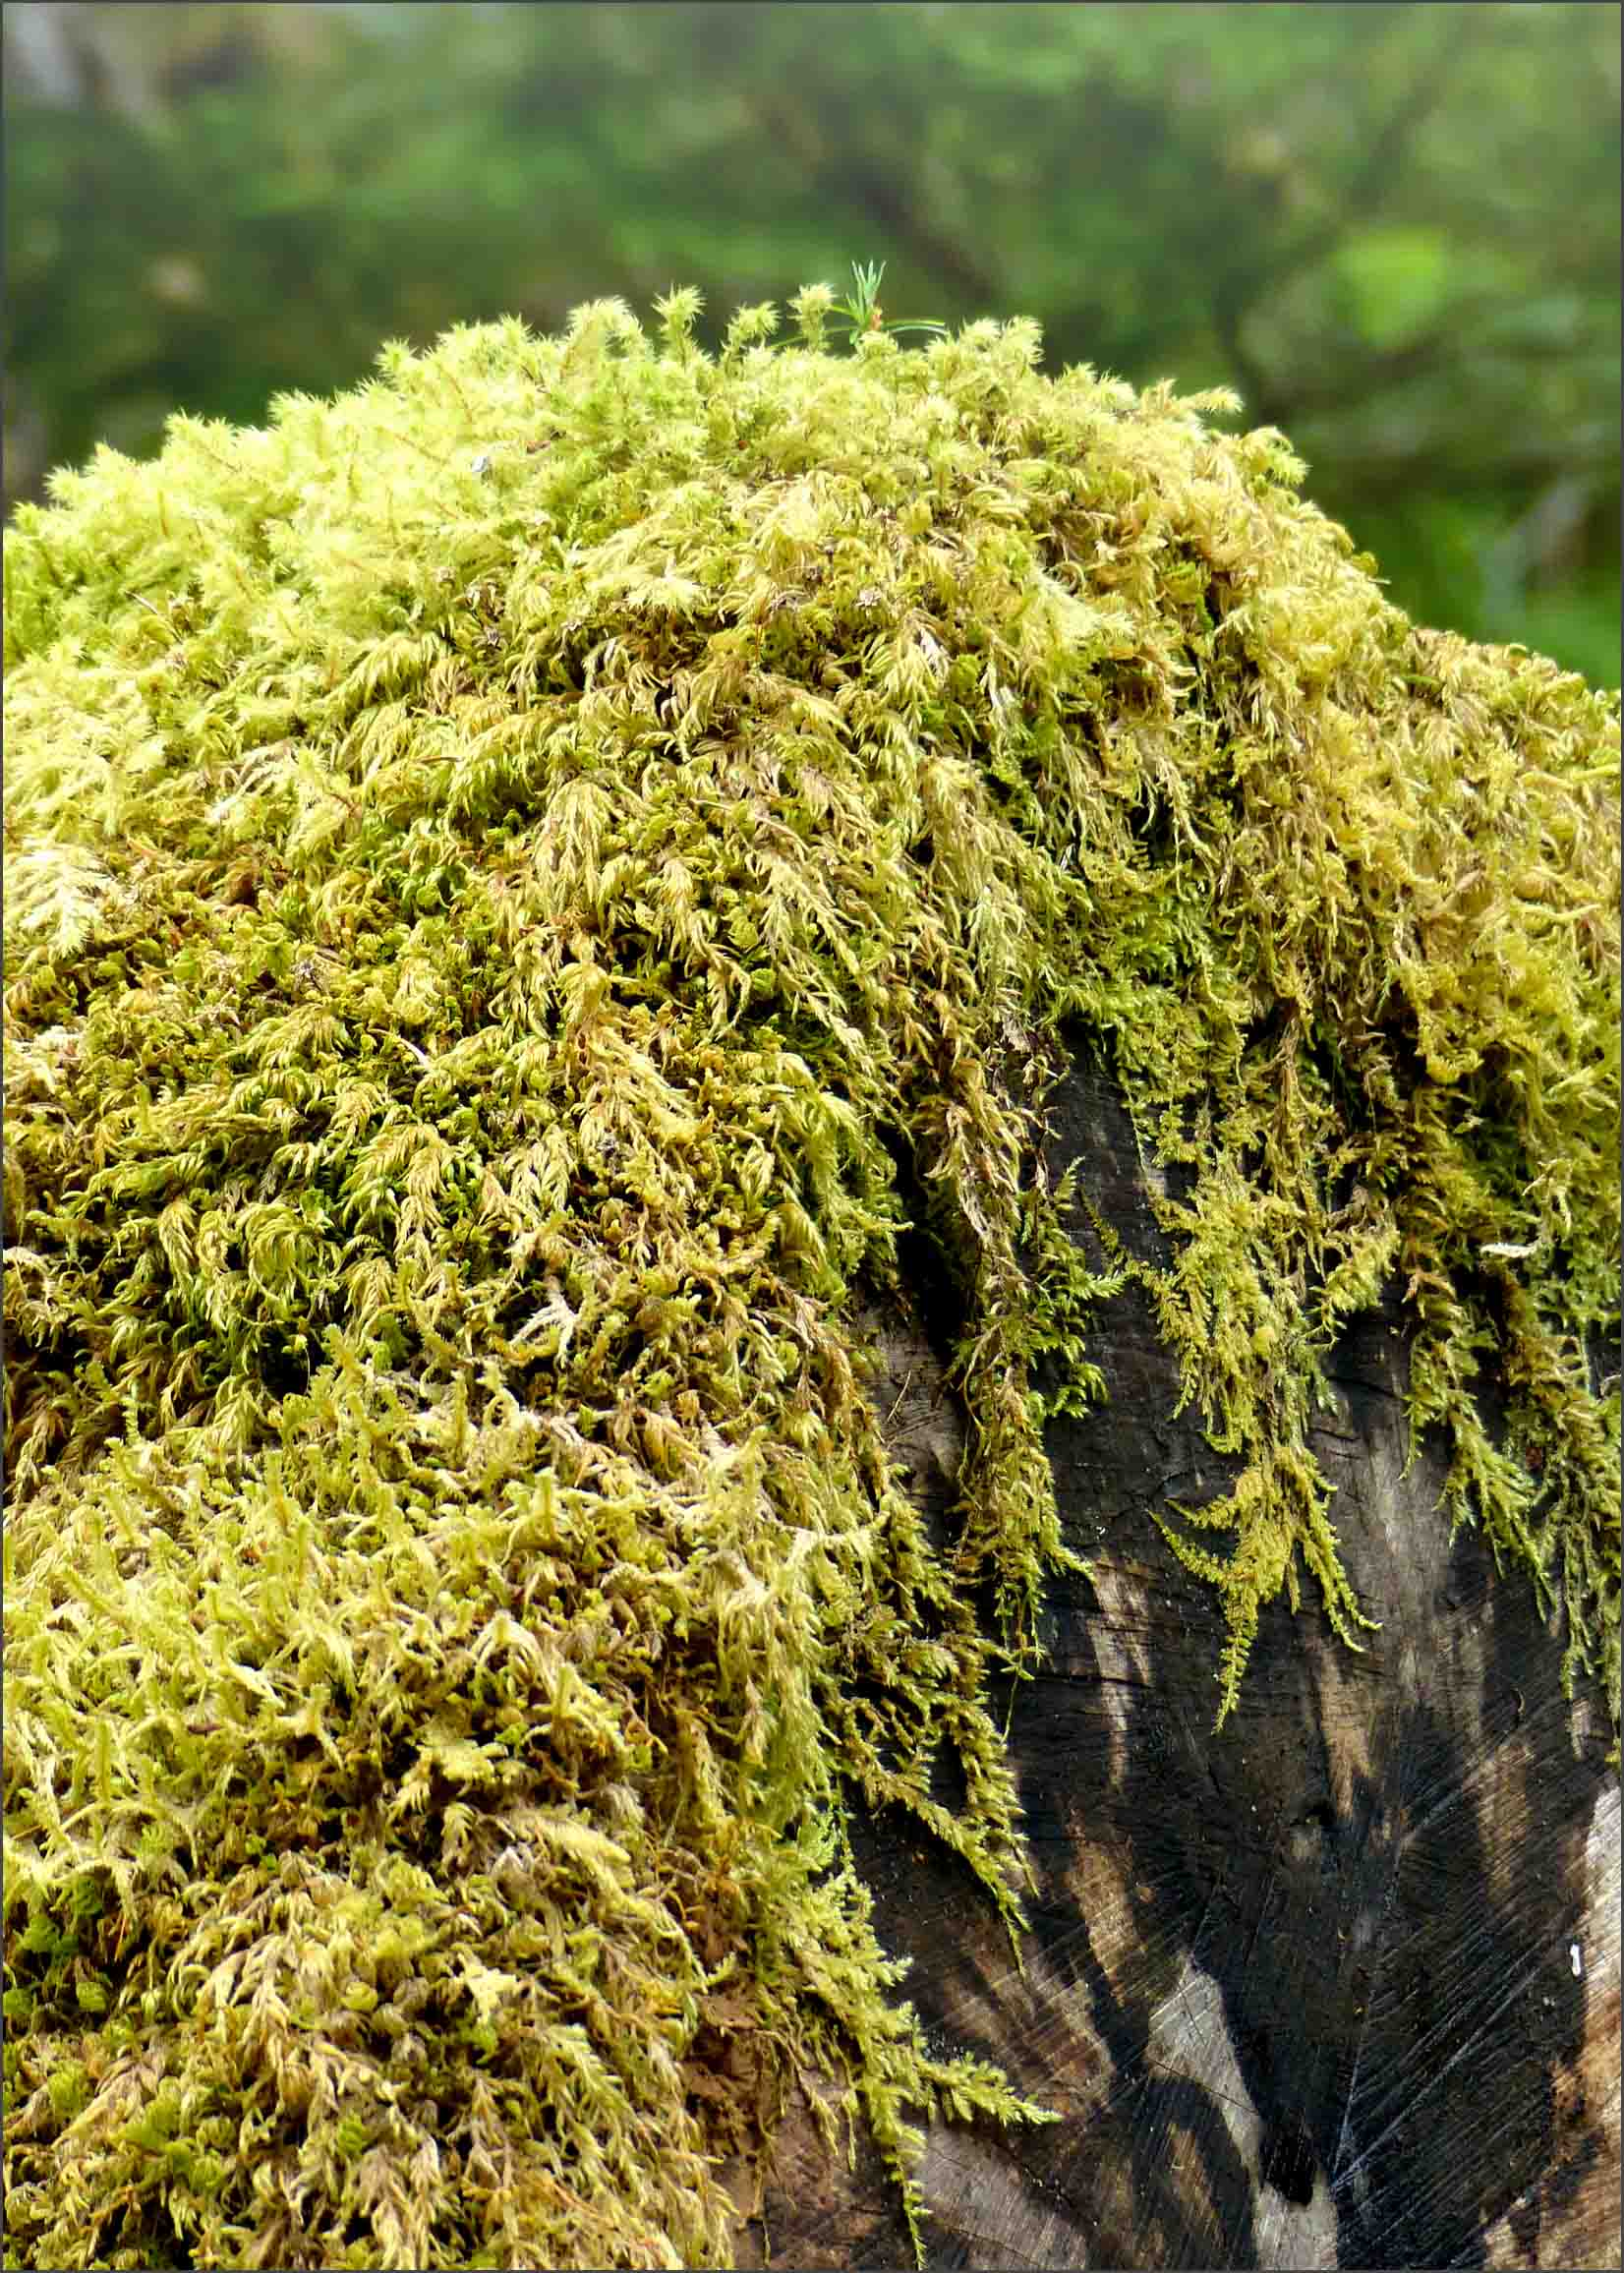 Tree trunk draped with lichen